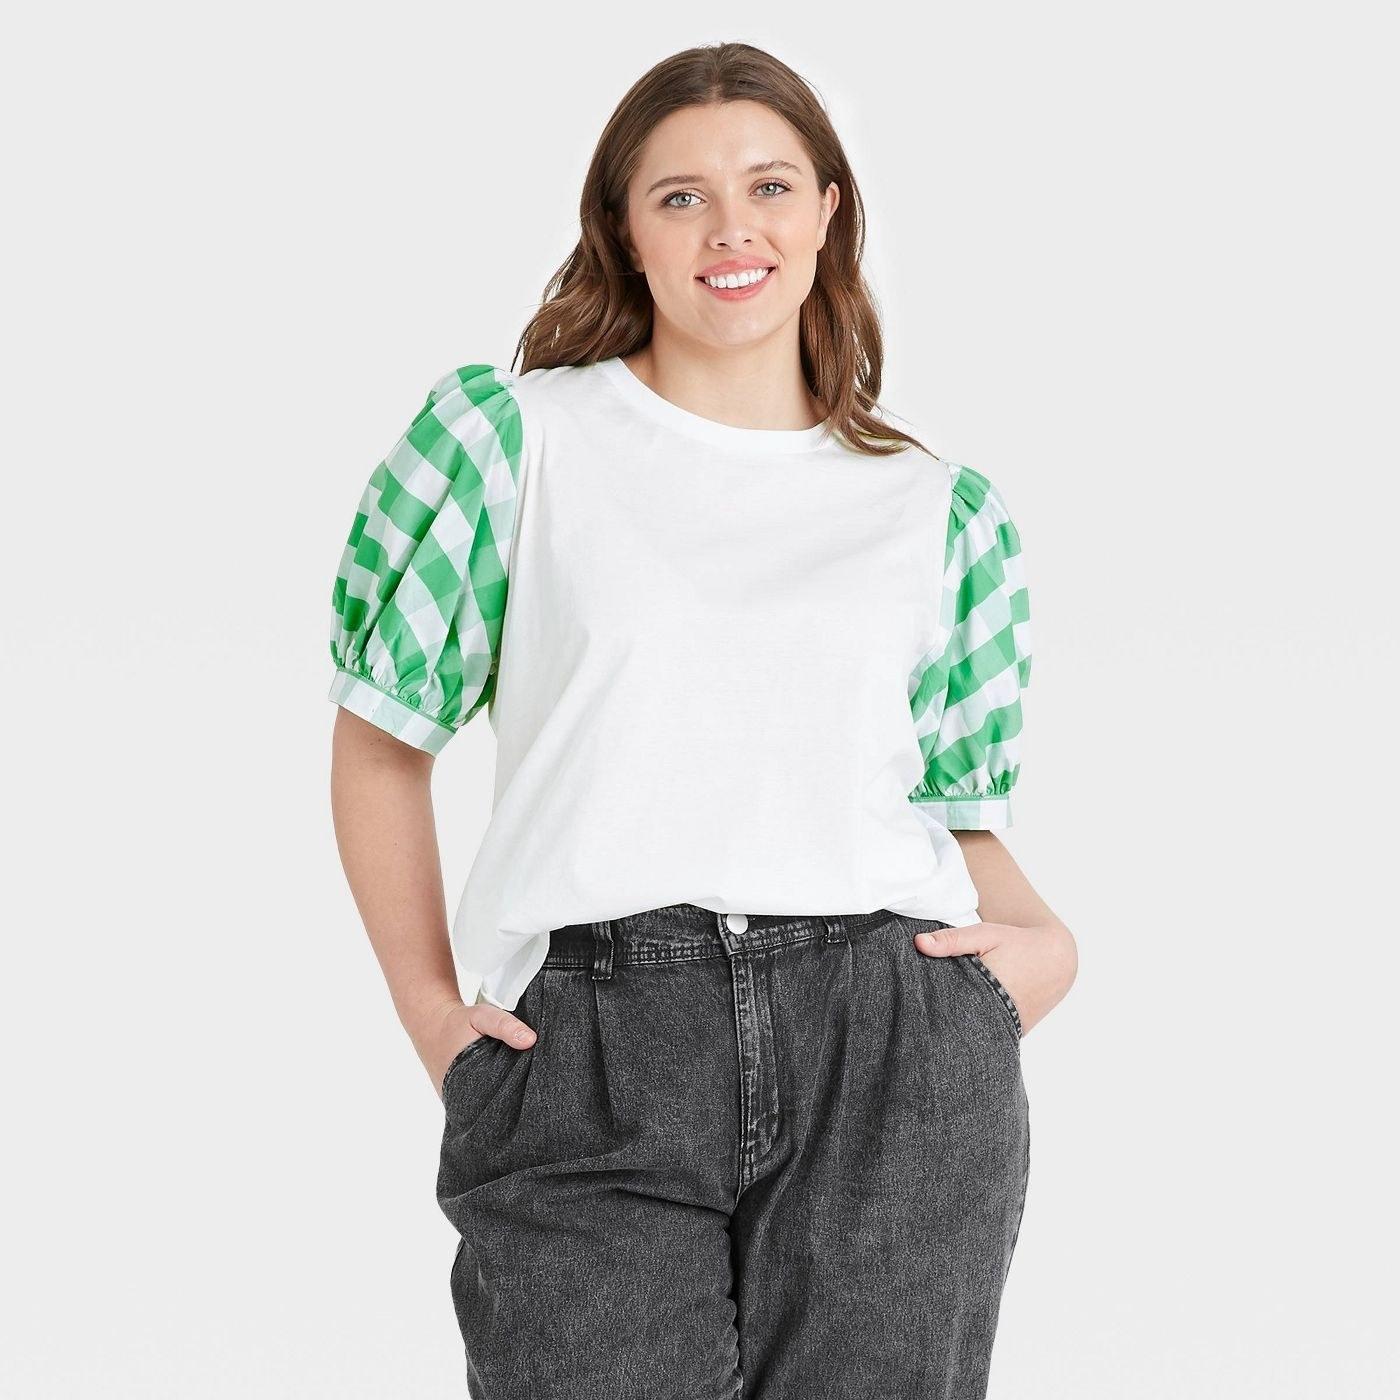 Model in puff sleeve tshirt